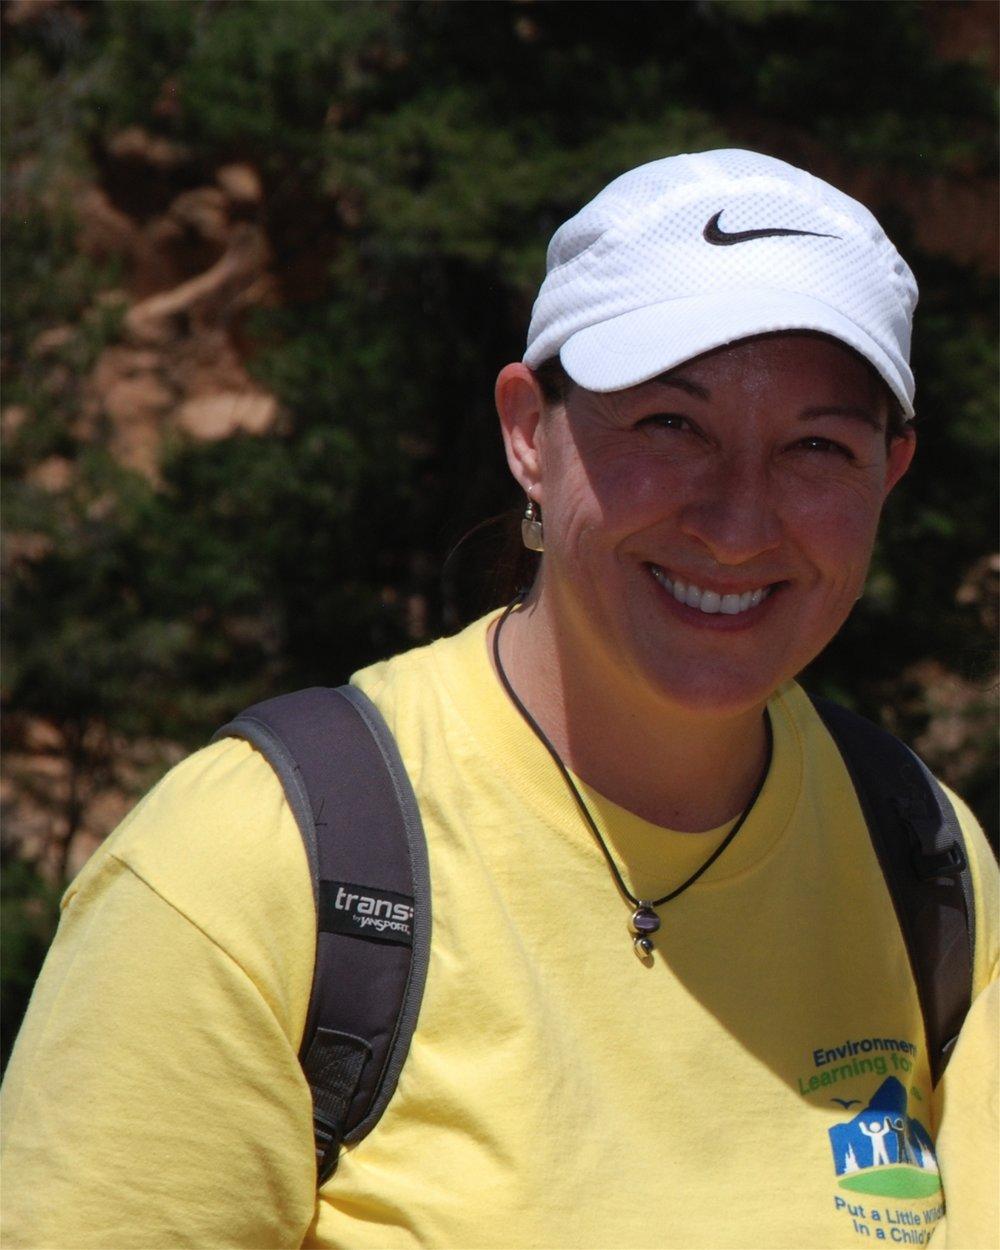 Stacie Gilmore8x10 1.JPG